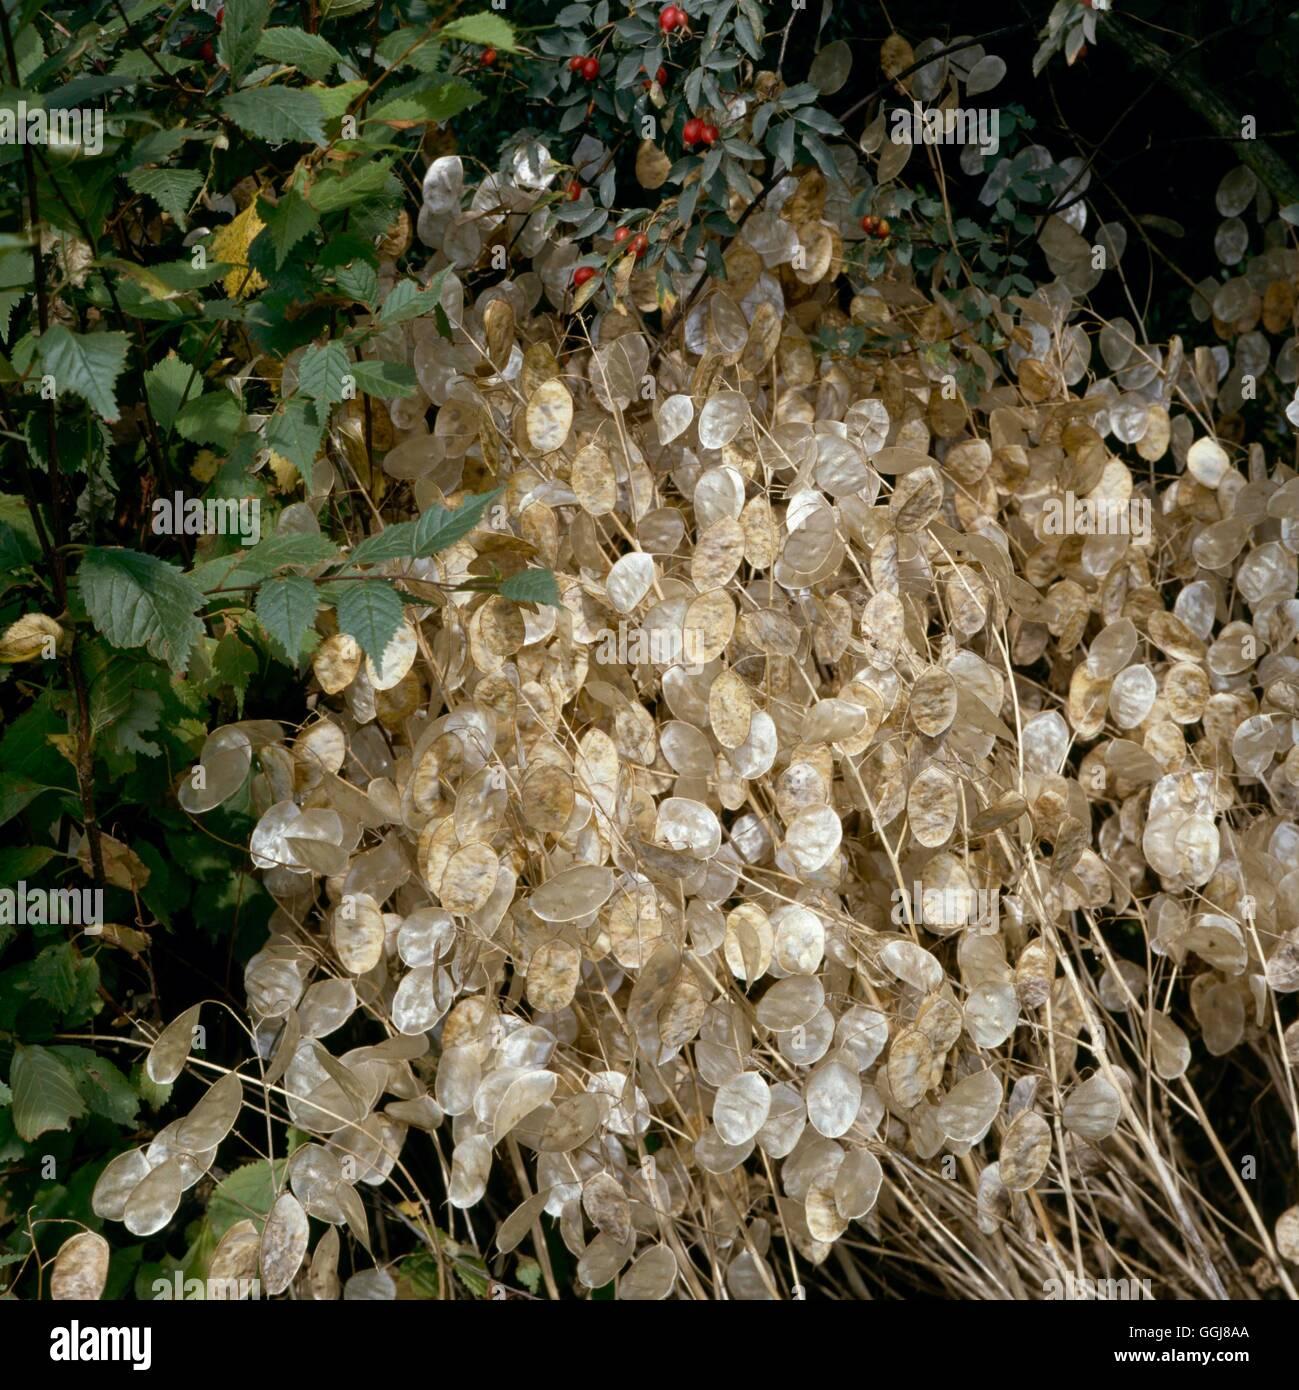 Dried Plants - Lunaria annua (Honesty)   DRI018642 - Stock Image